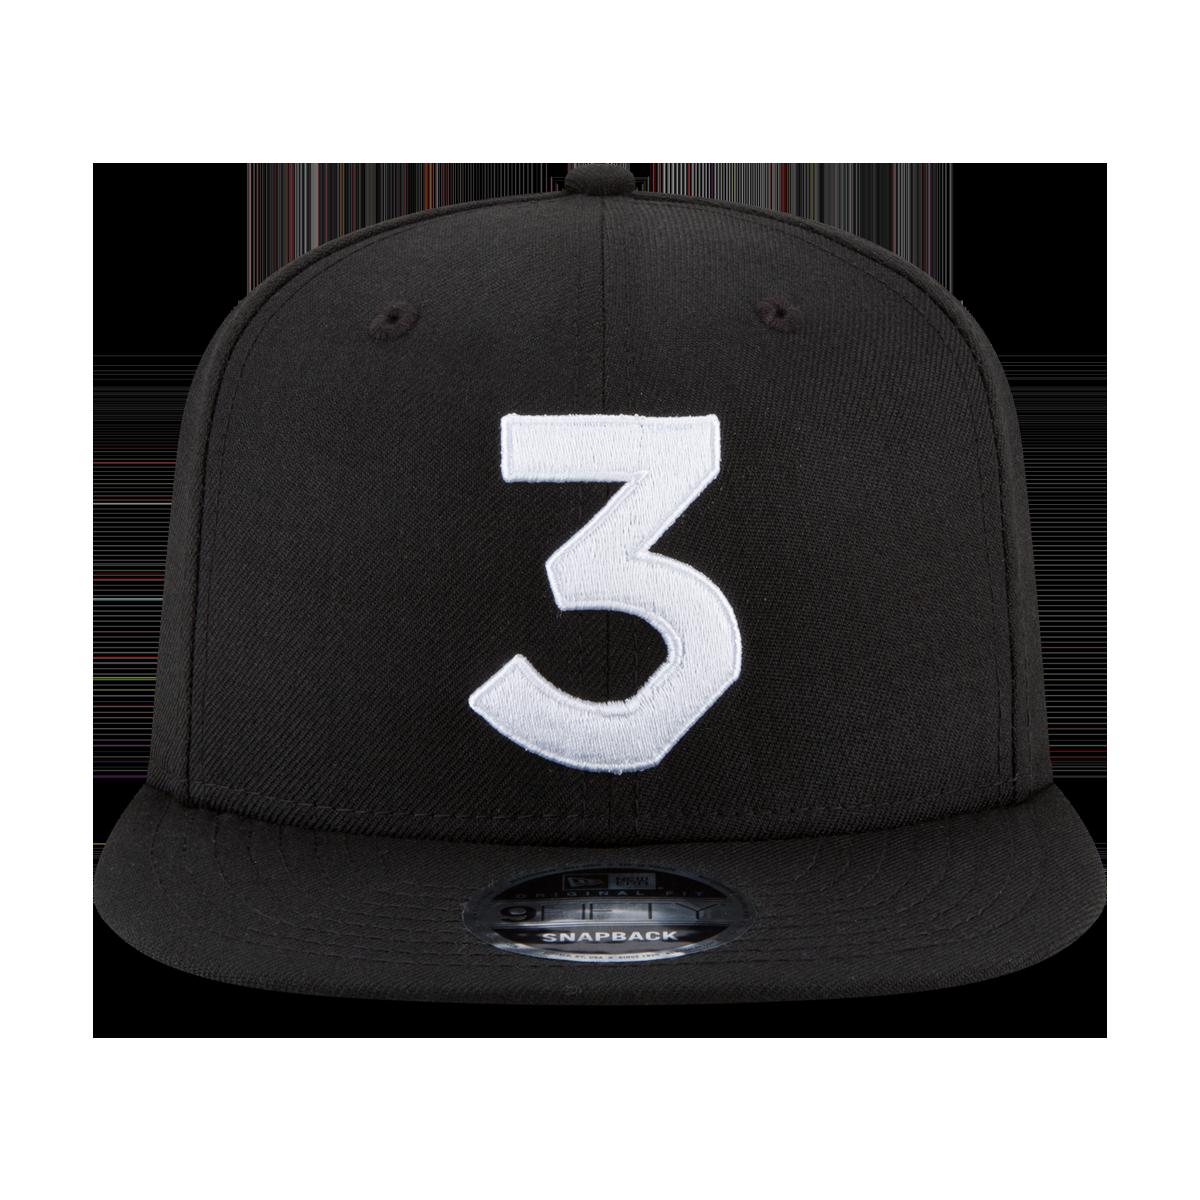 Chance 3 New Era Cap — Chance the Rapper e3b6ce0250d